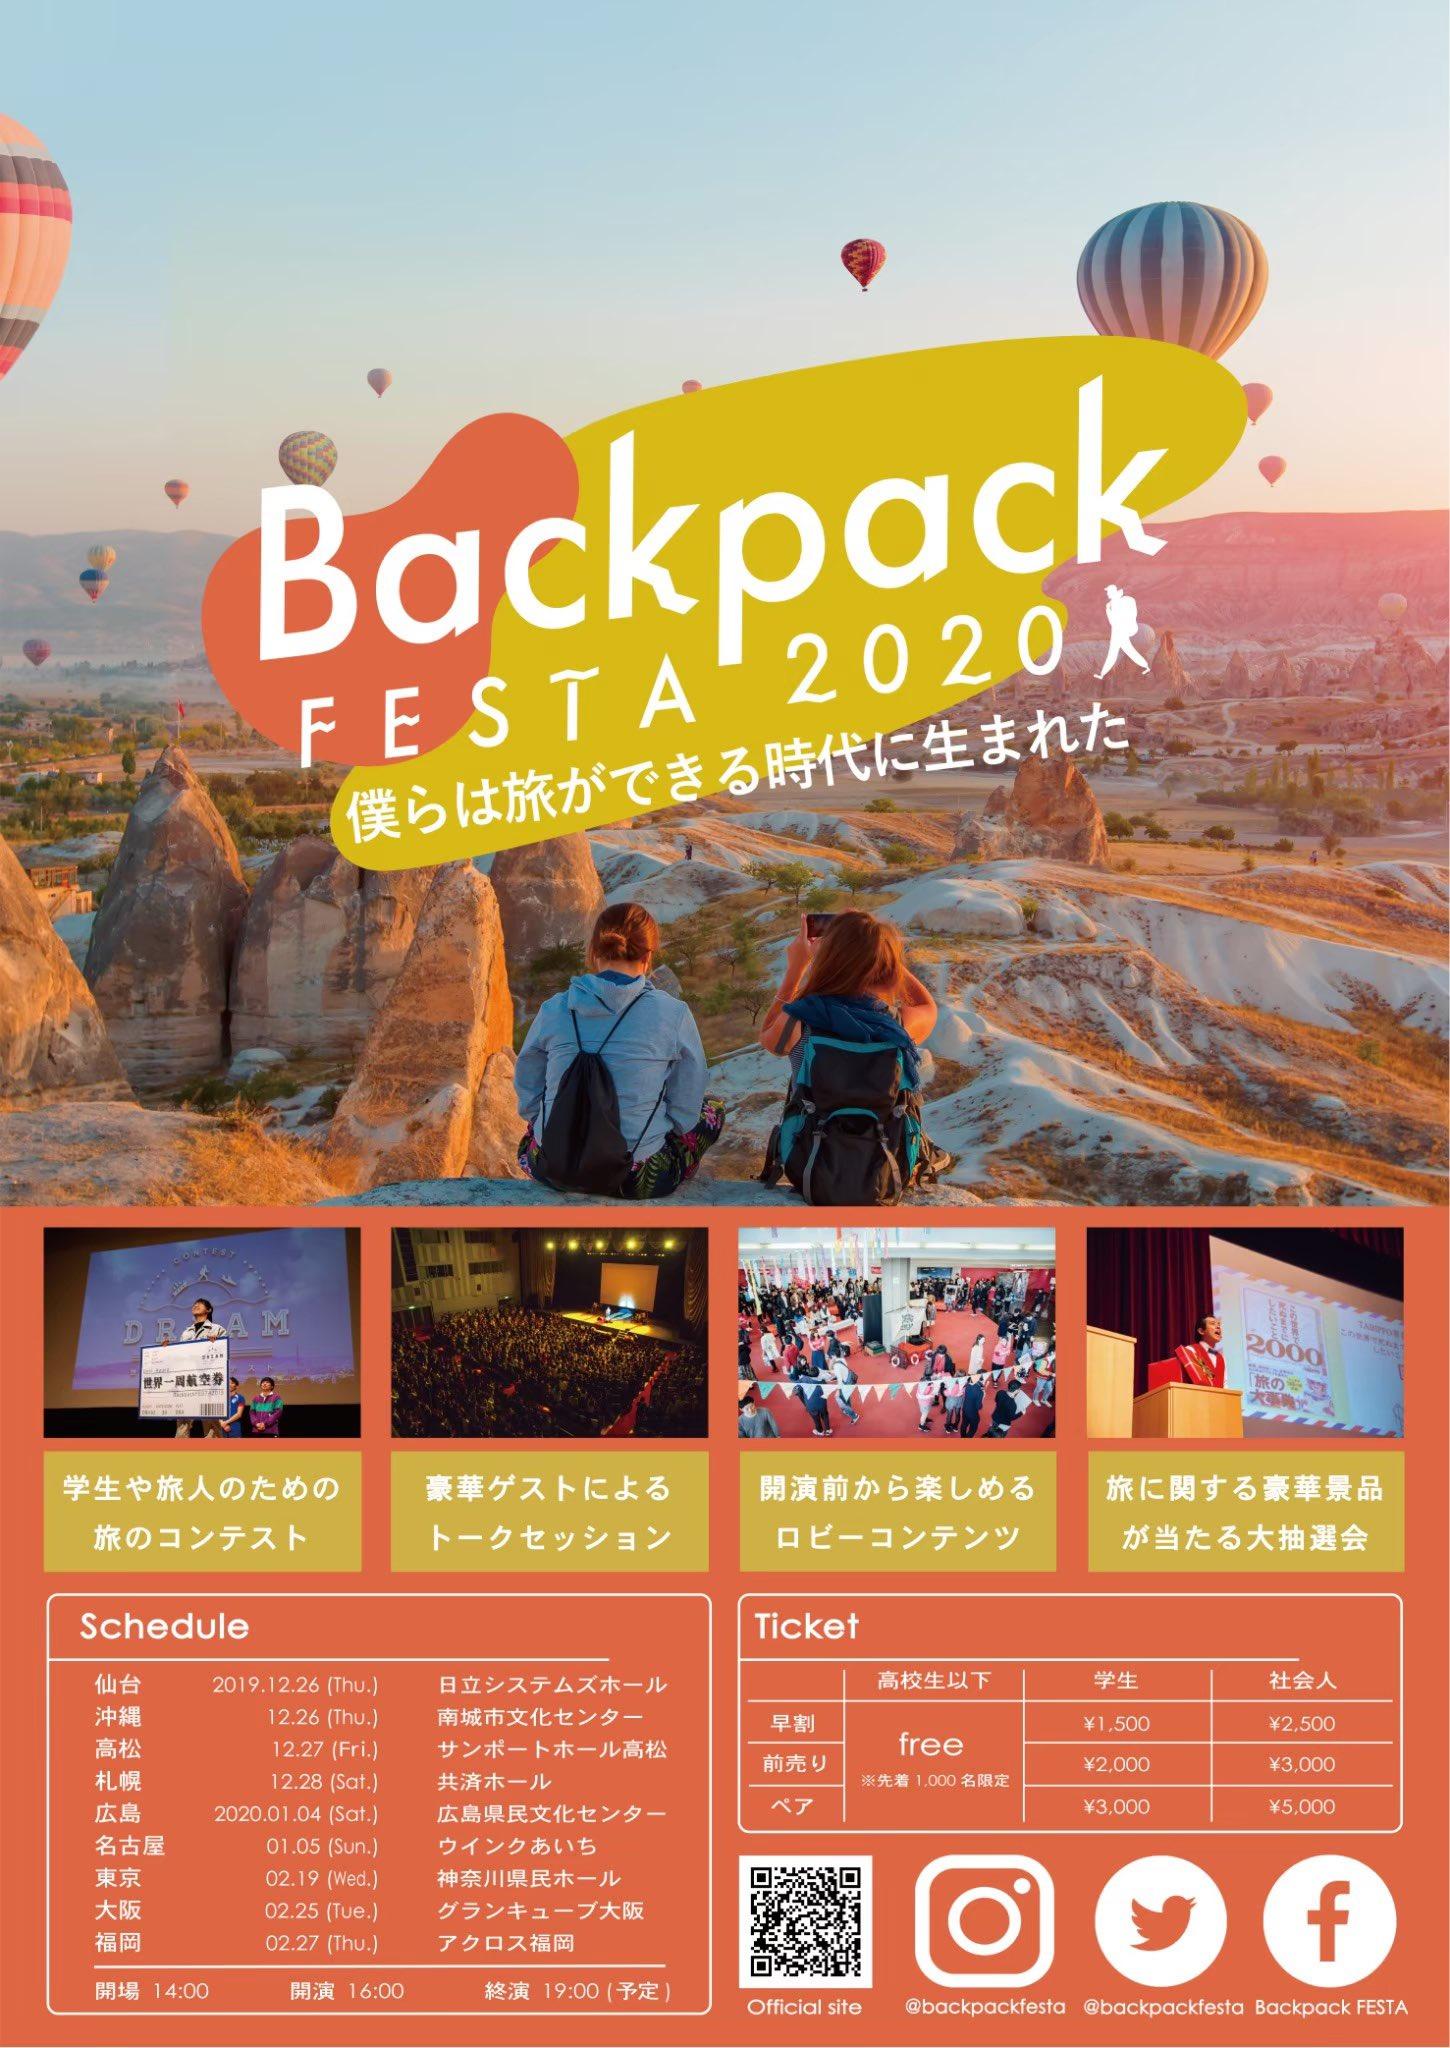 BackpackFESTA 2020のポスター